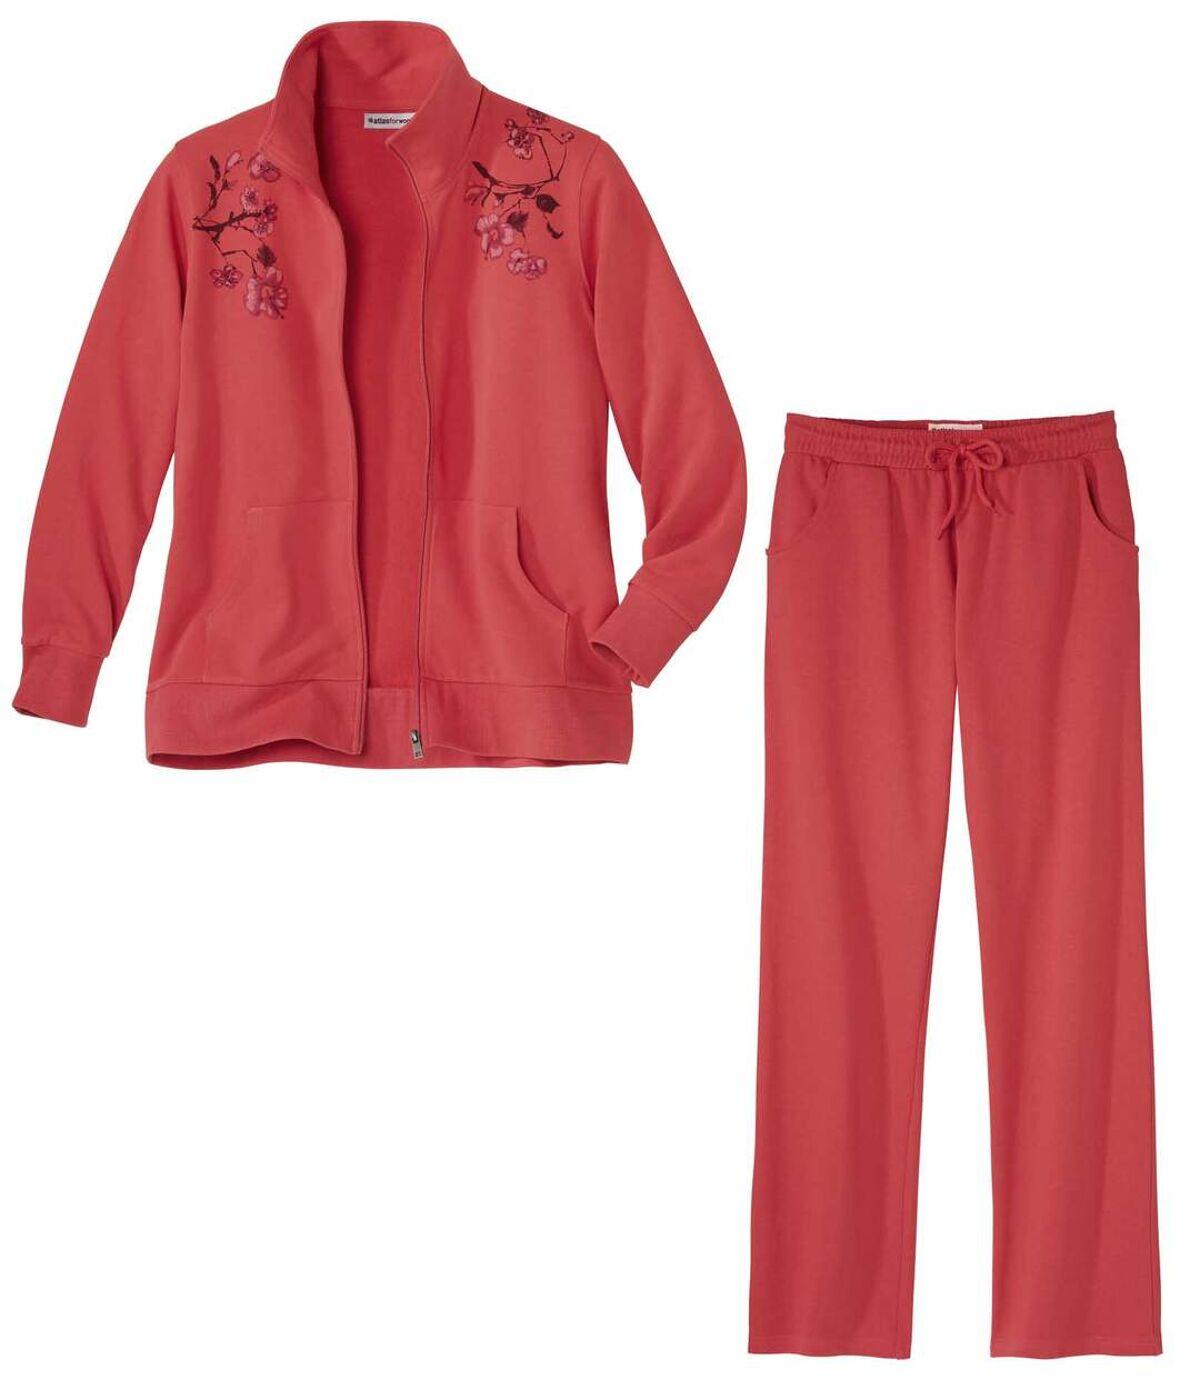 Women's Coral Pink Loungewear Set Atlas For Men